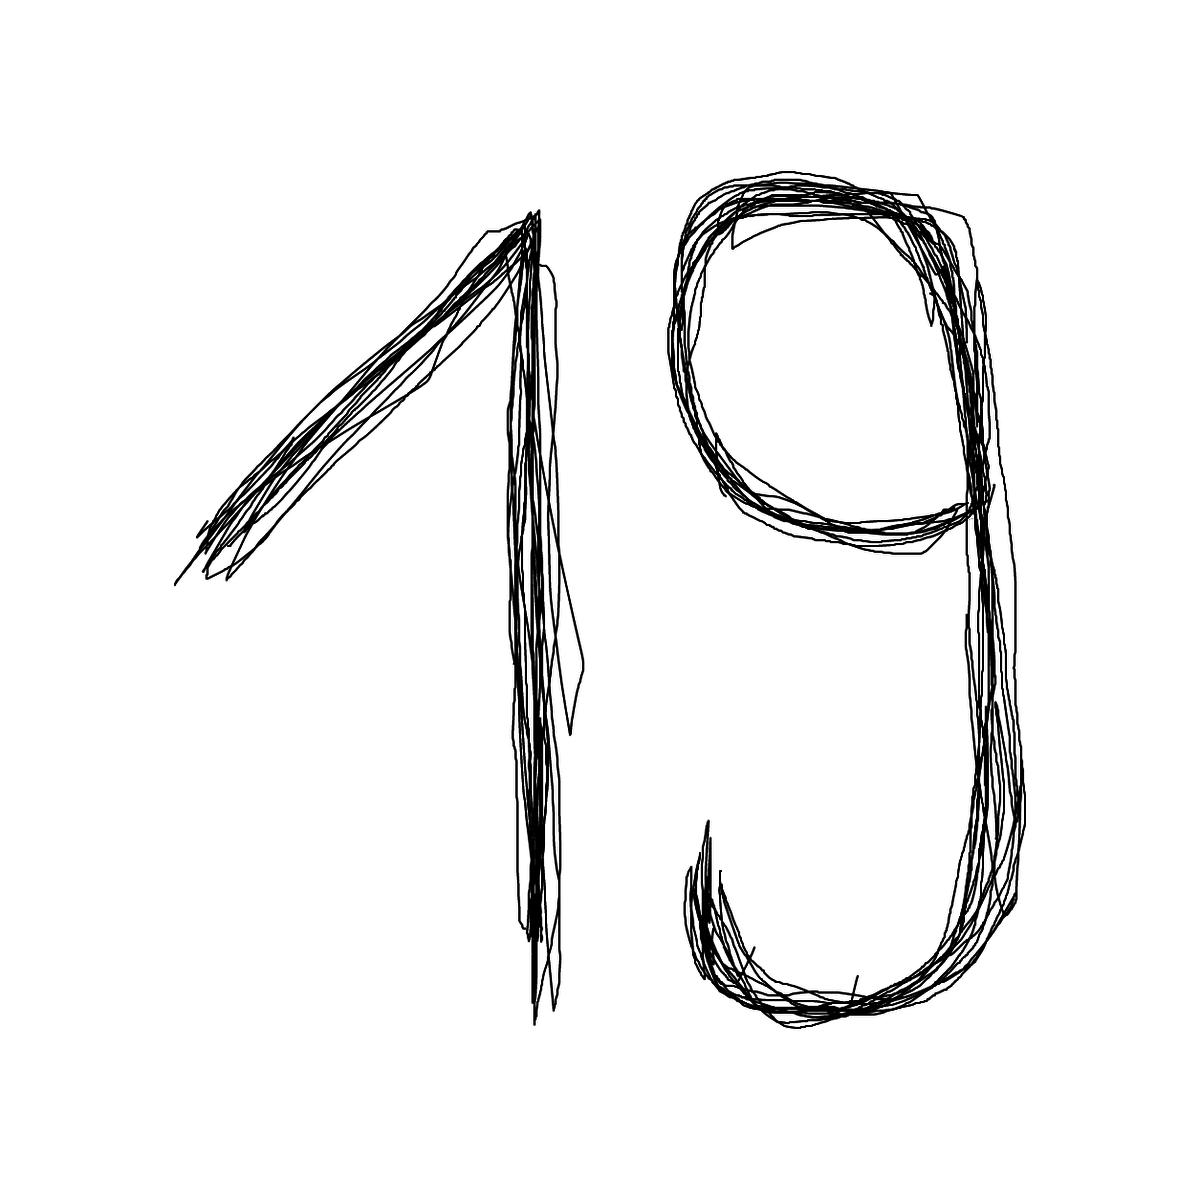 BAAAM drawing#18975 lat:52.2267799377441400lng: 20.9357147216796880